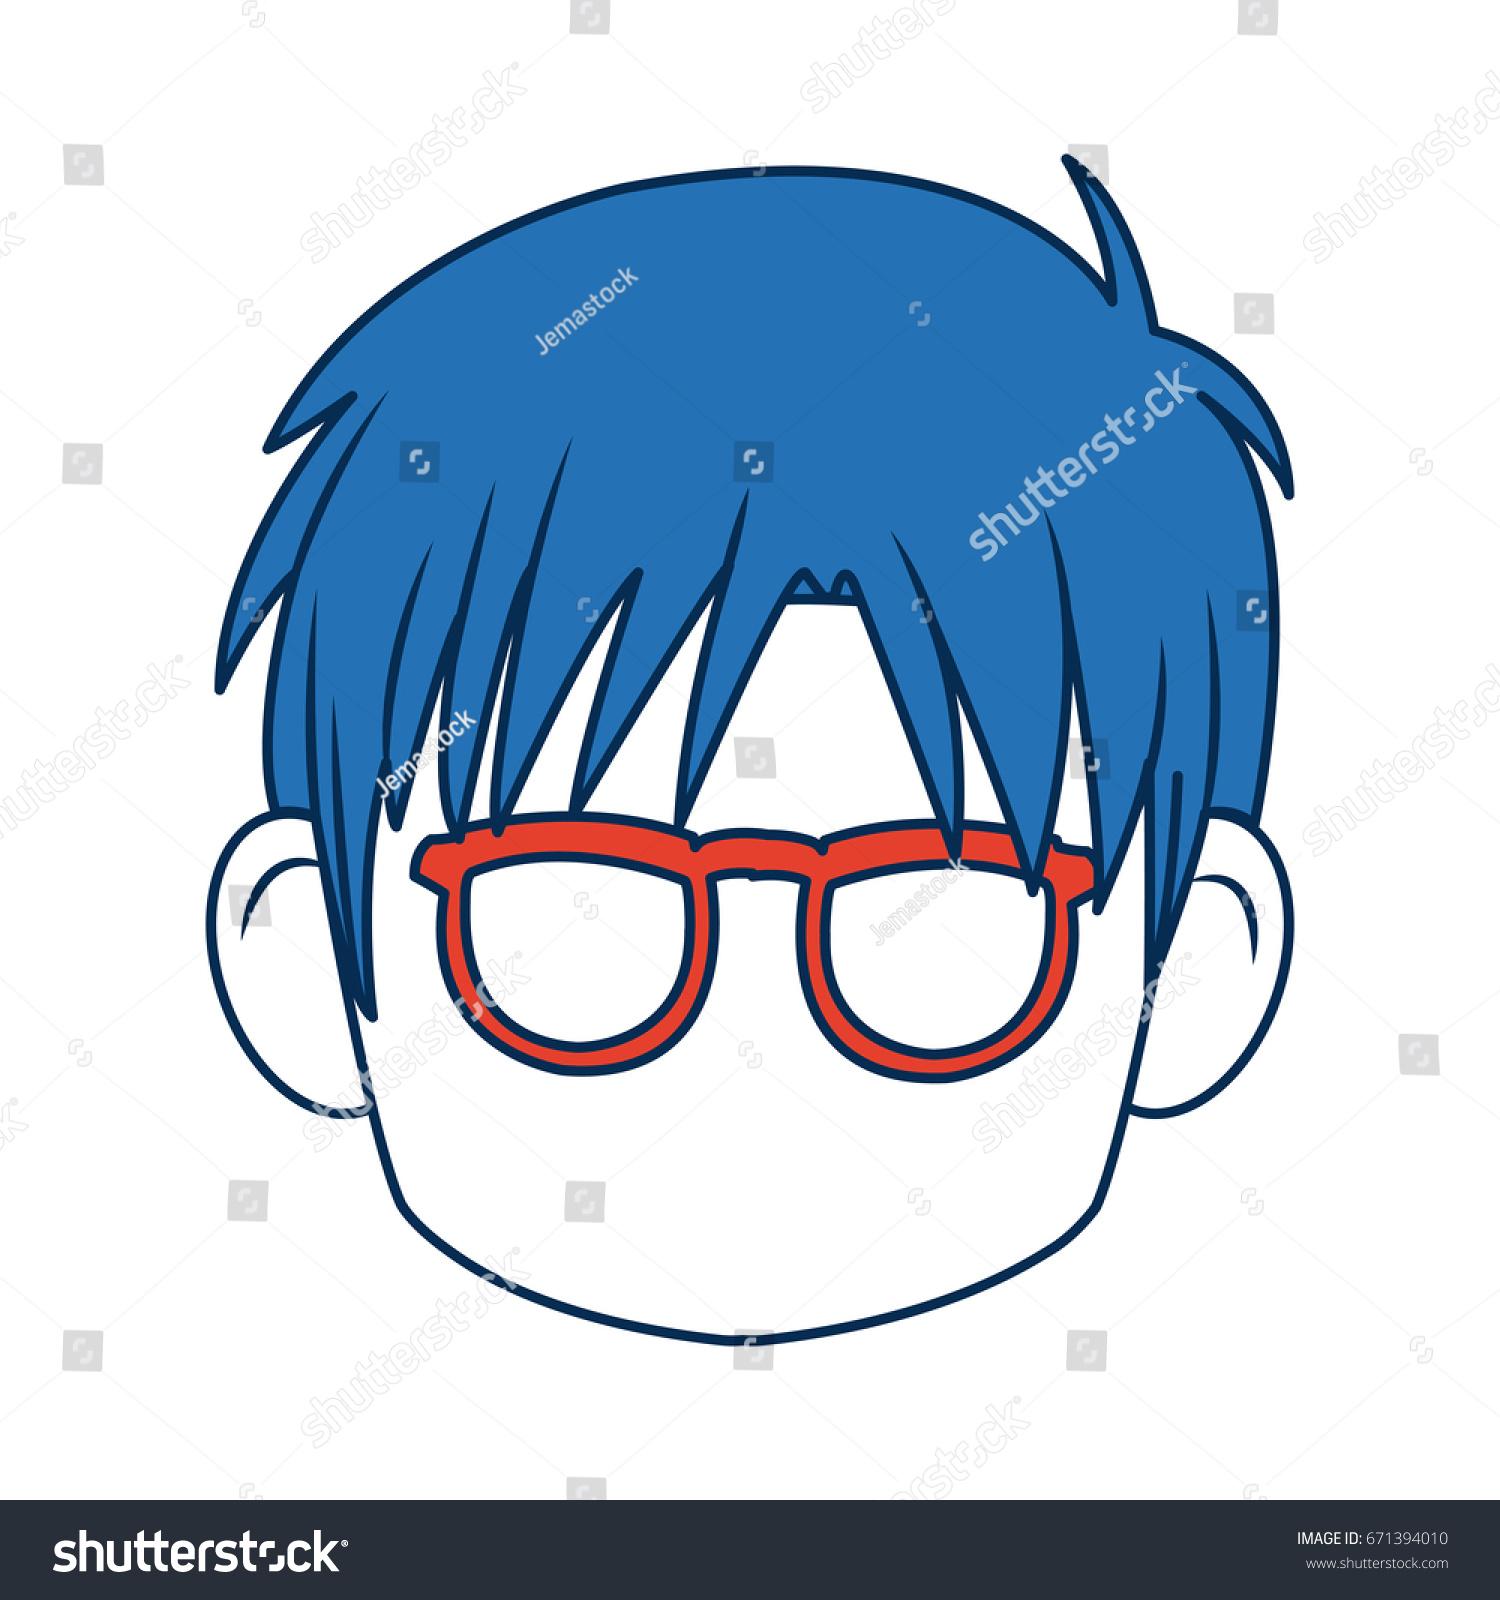 Anime Boy Blue Hair Glasses Stock Vector Royalty Free 671394010